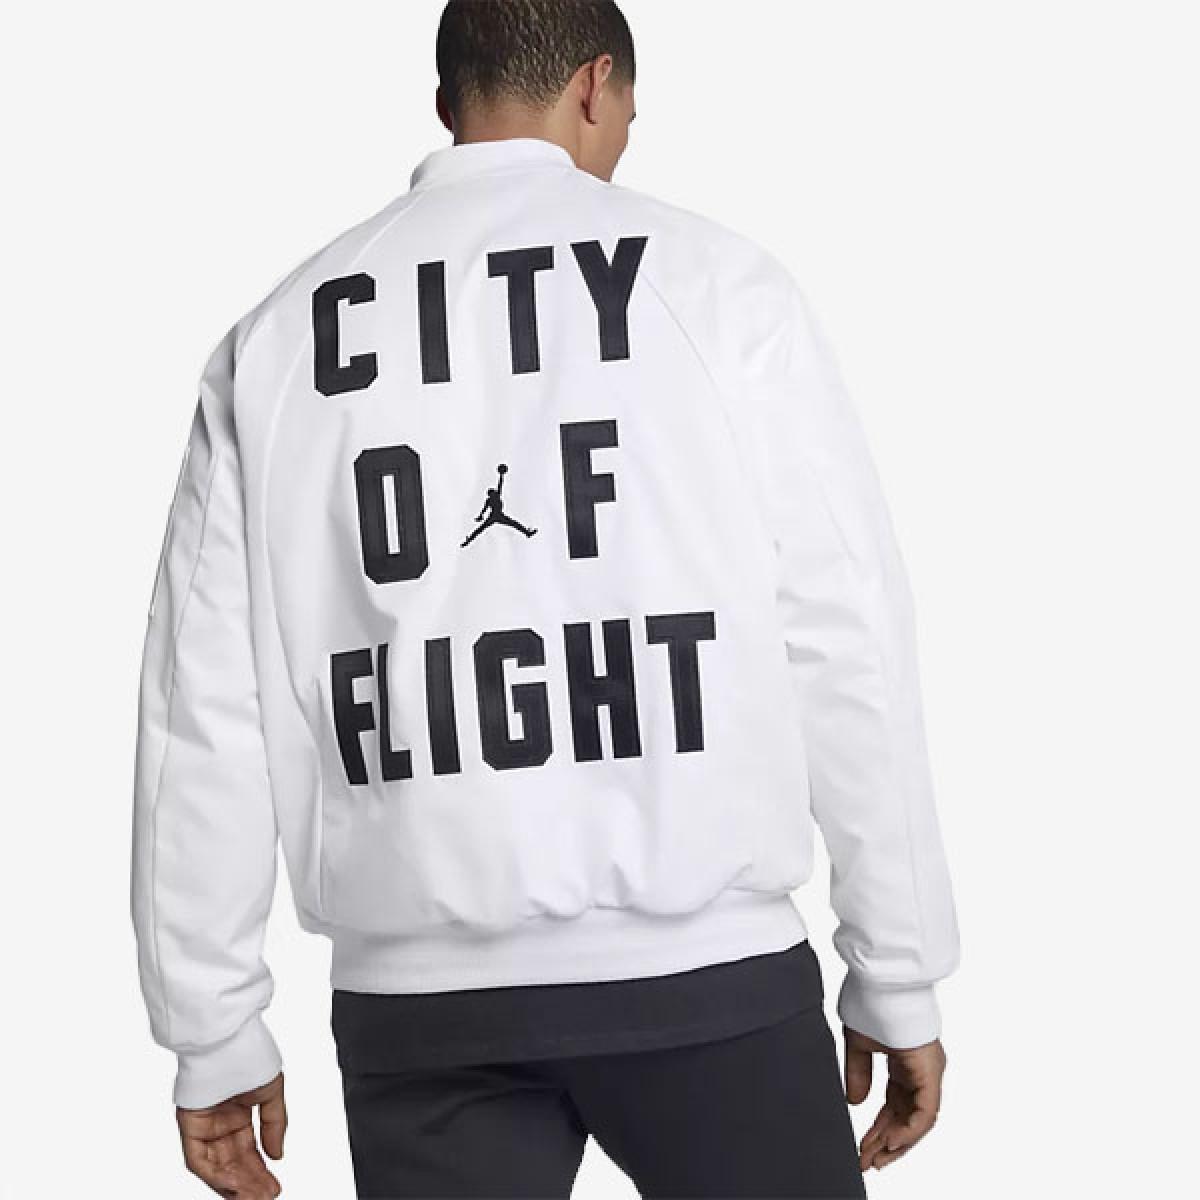 Jordan Wings White Jacket 'City of Flight'